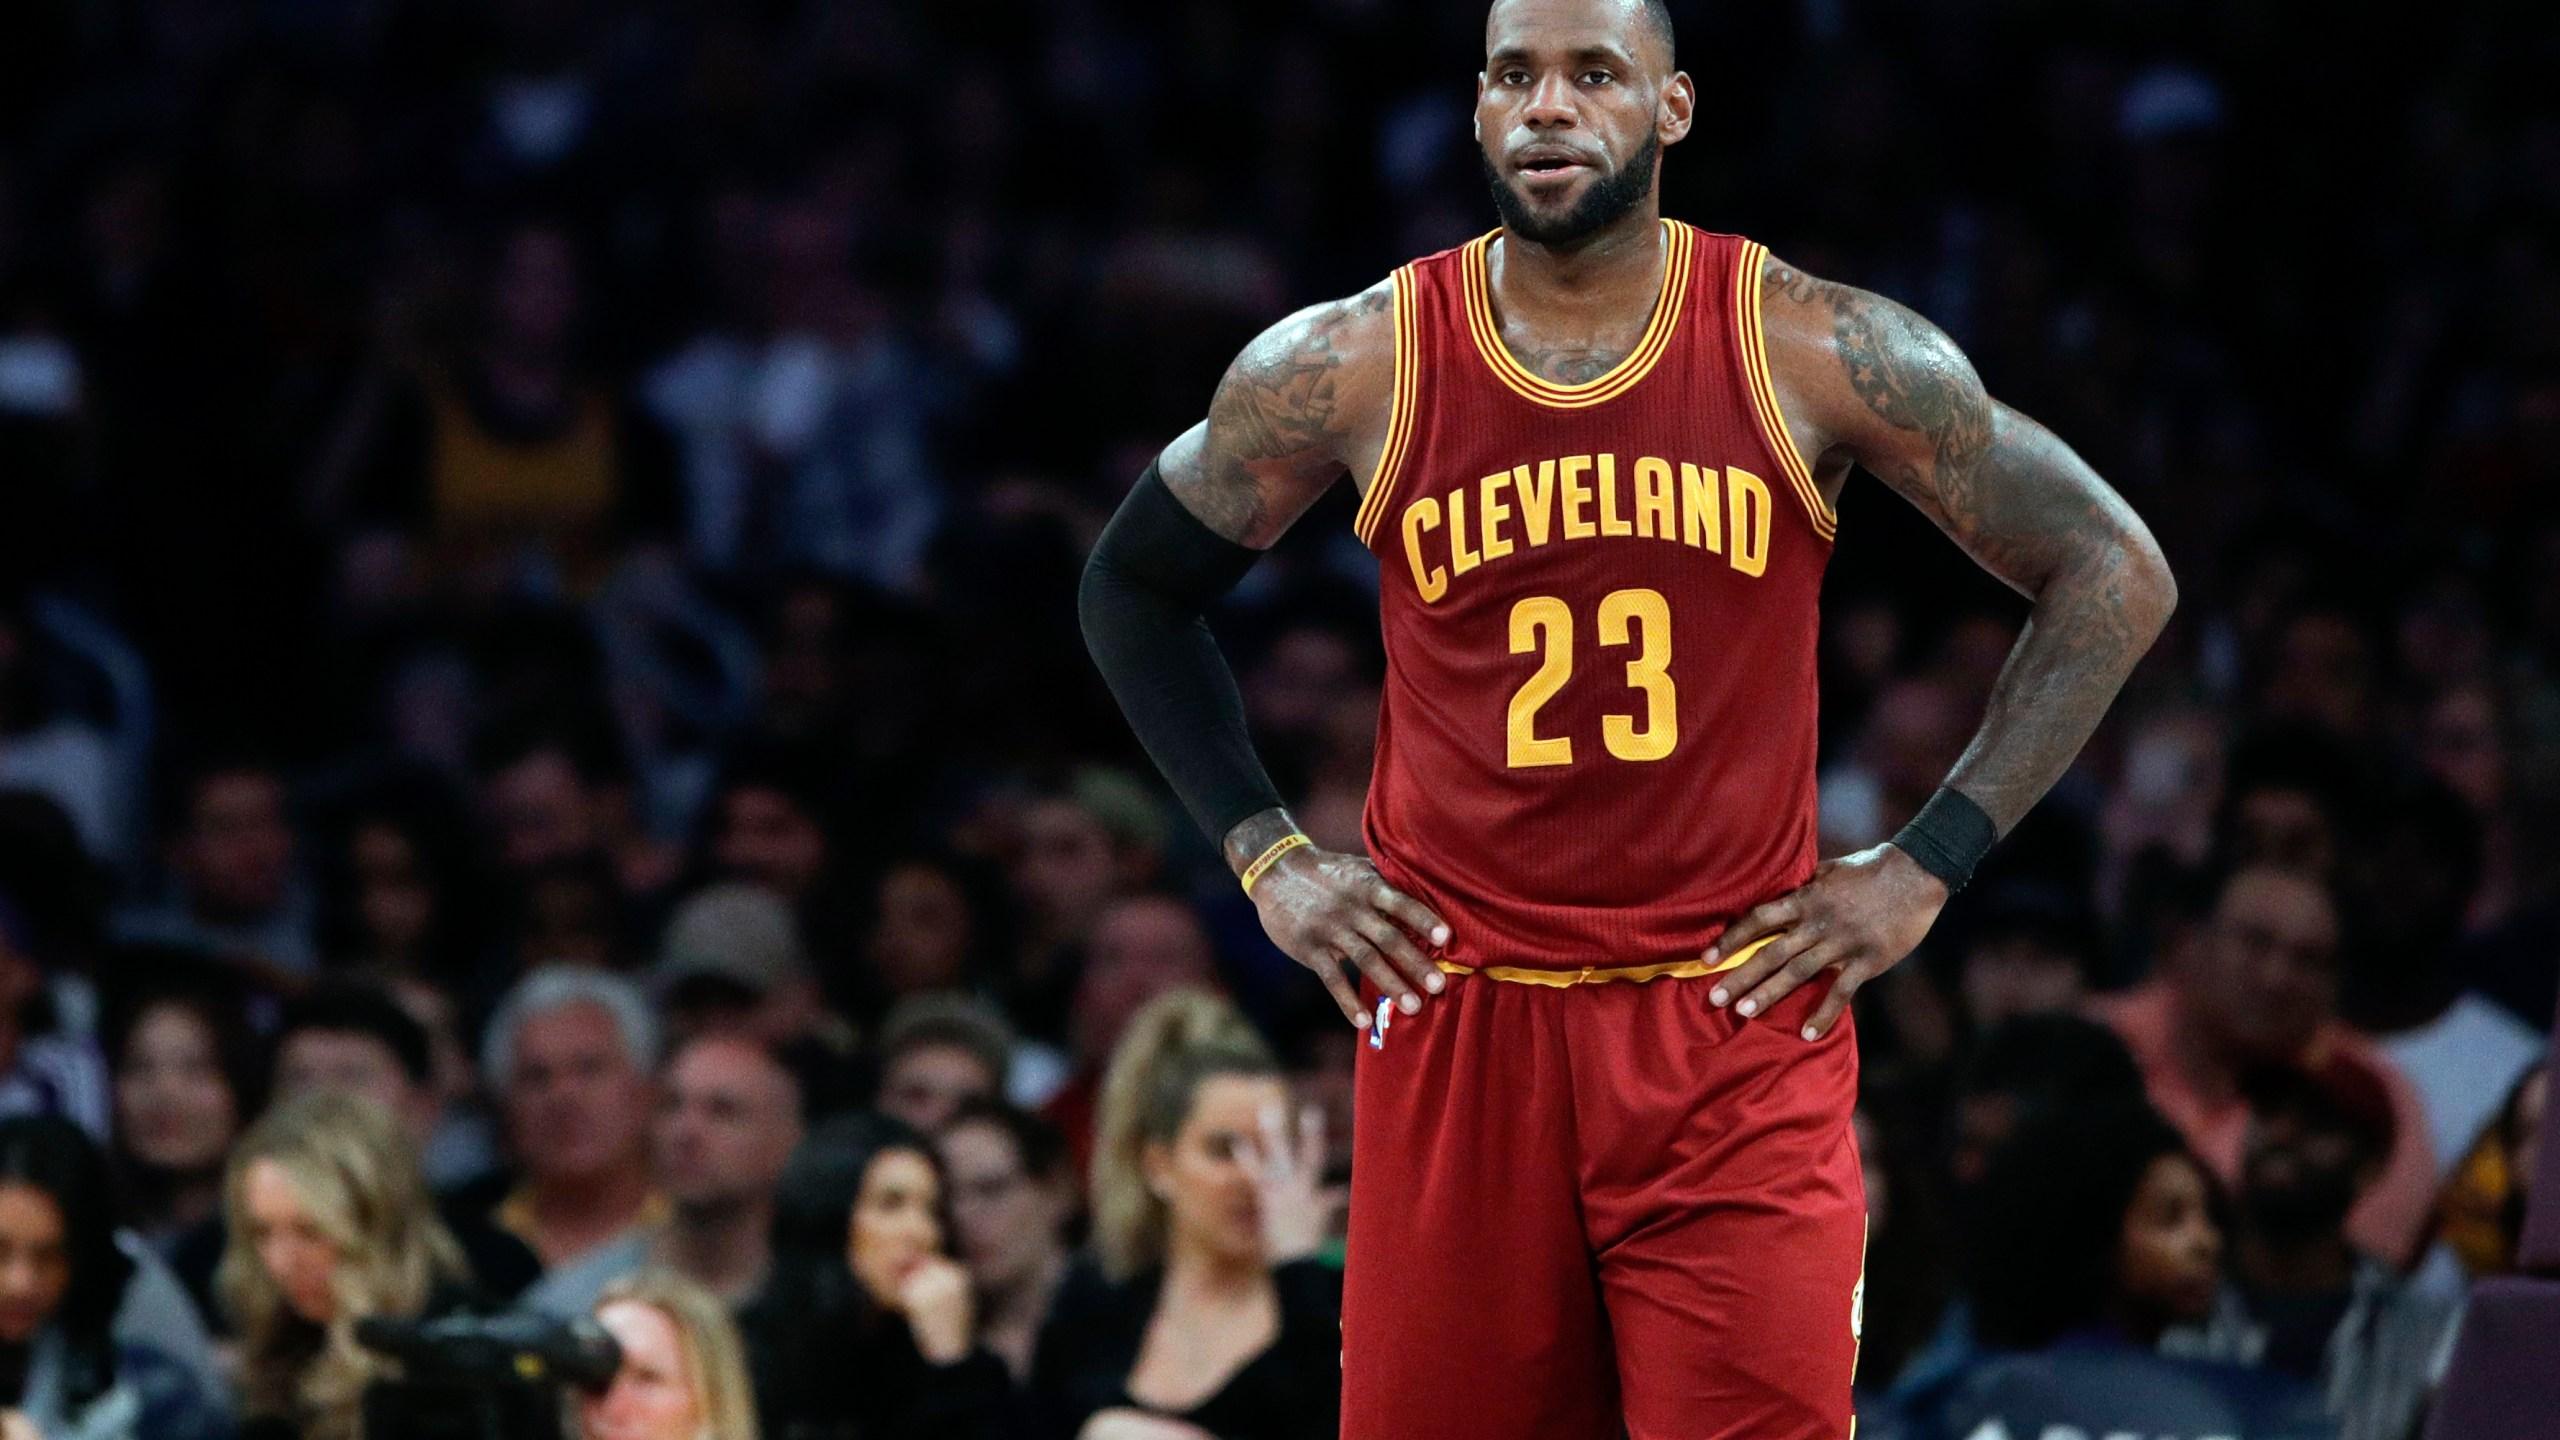 NBA_Free_Agency_LeBron's_Options_Basketall_18644-159532.jpg37652895